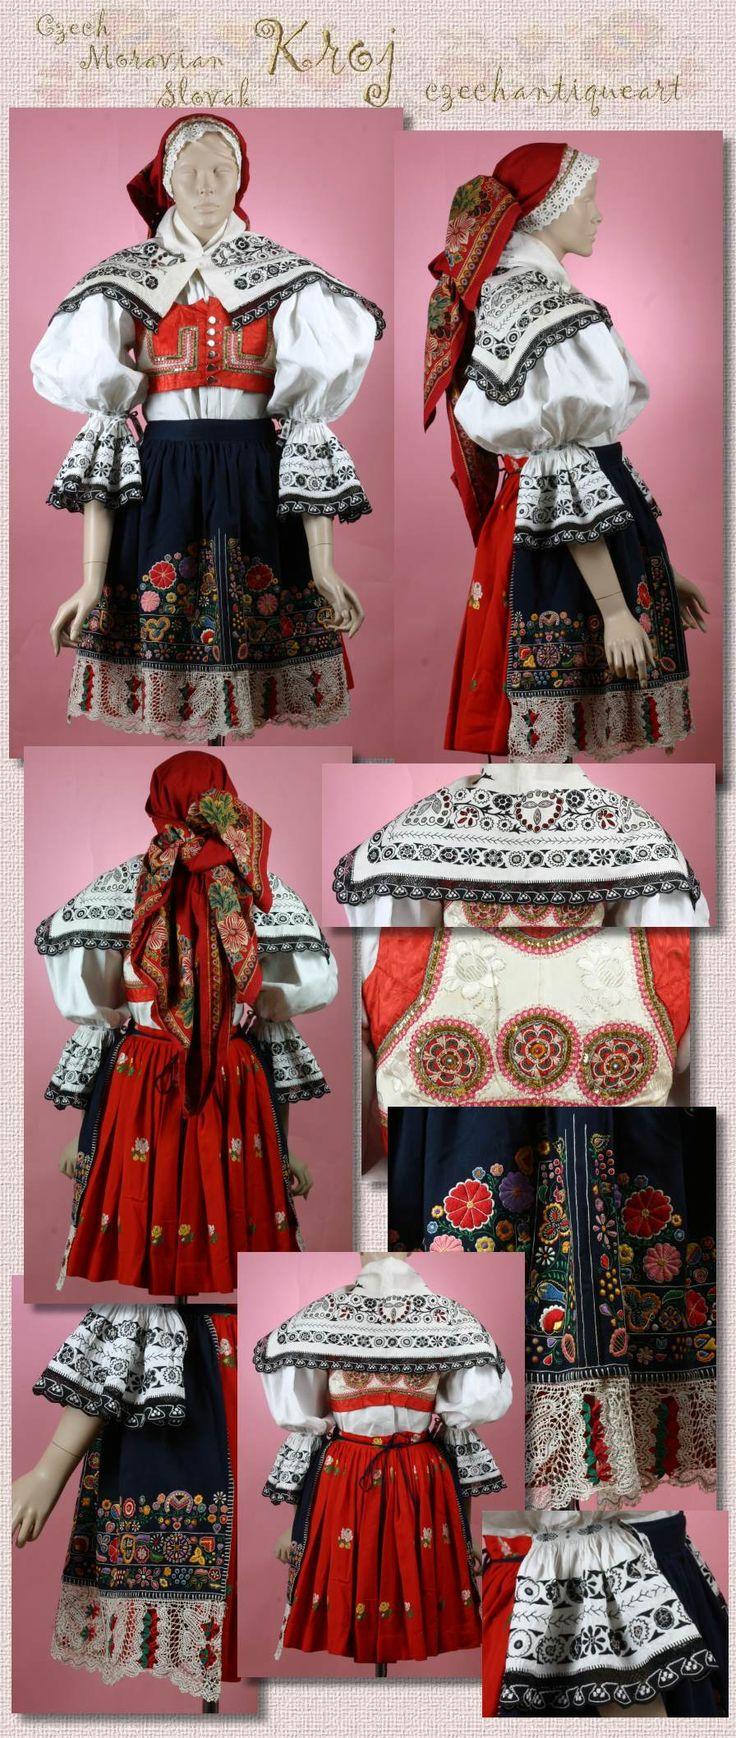 Kyjov folk costum; http://www.czechgallery.com/museum/image/kyjov-youngwoman.jpg